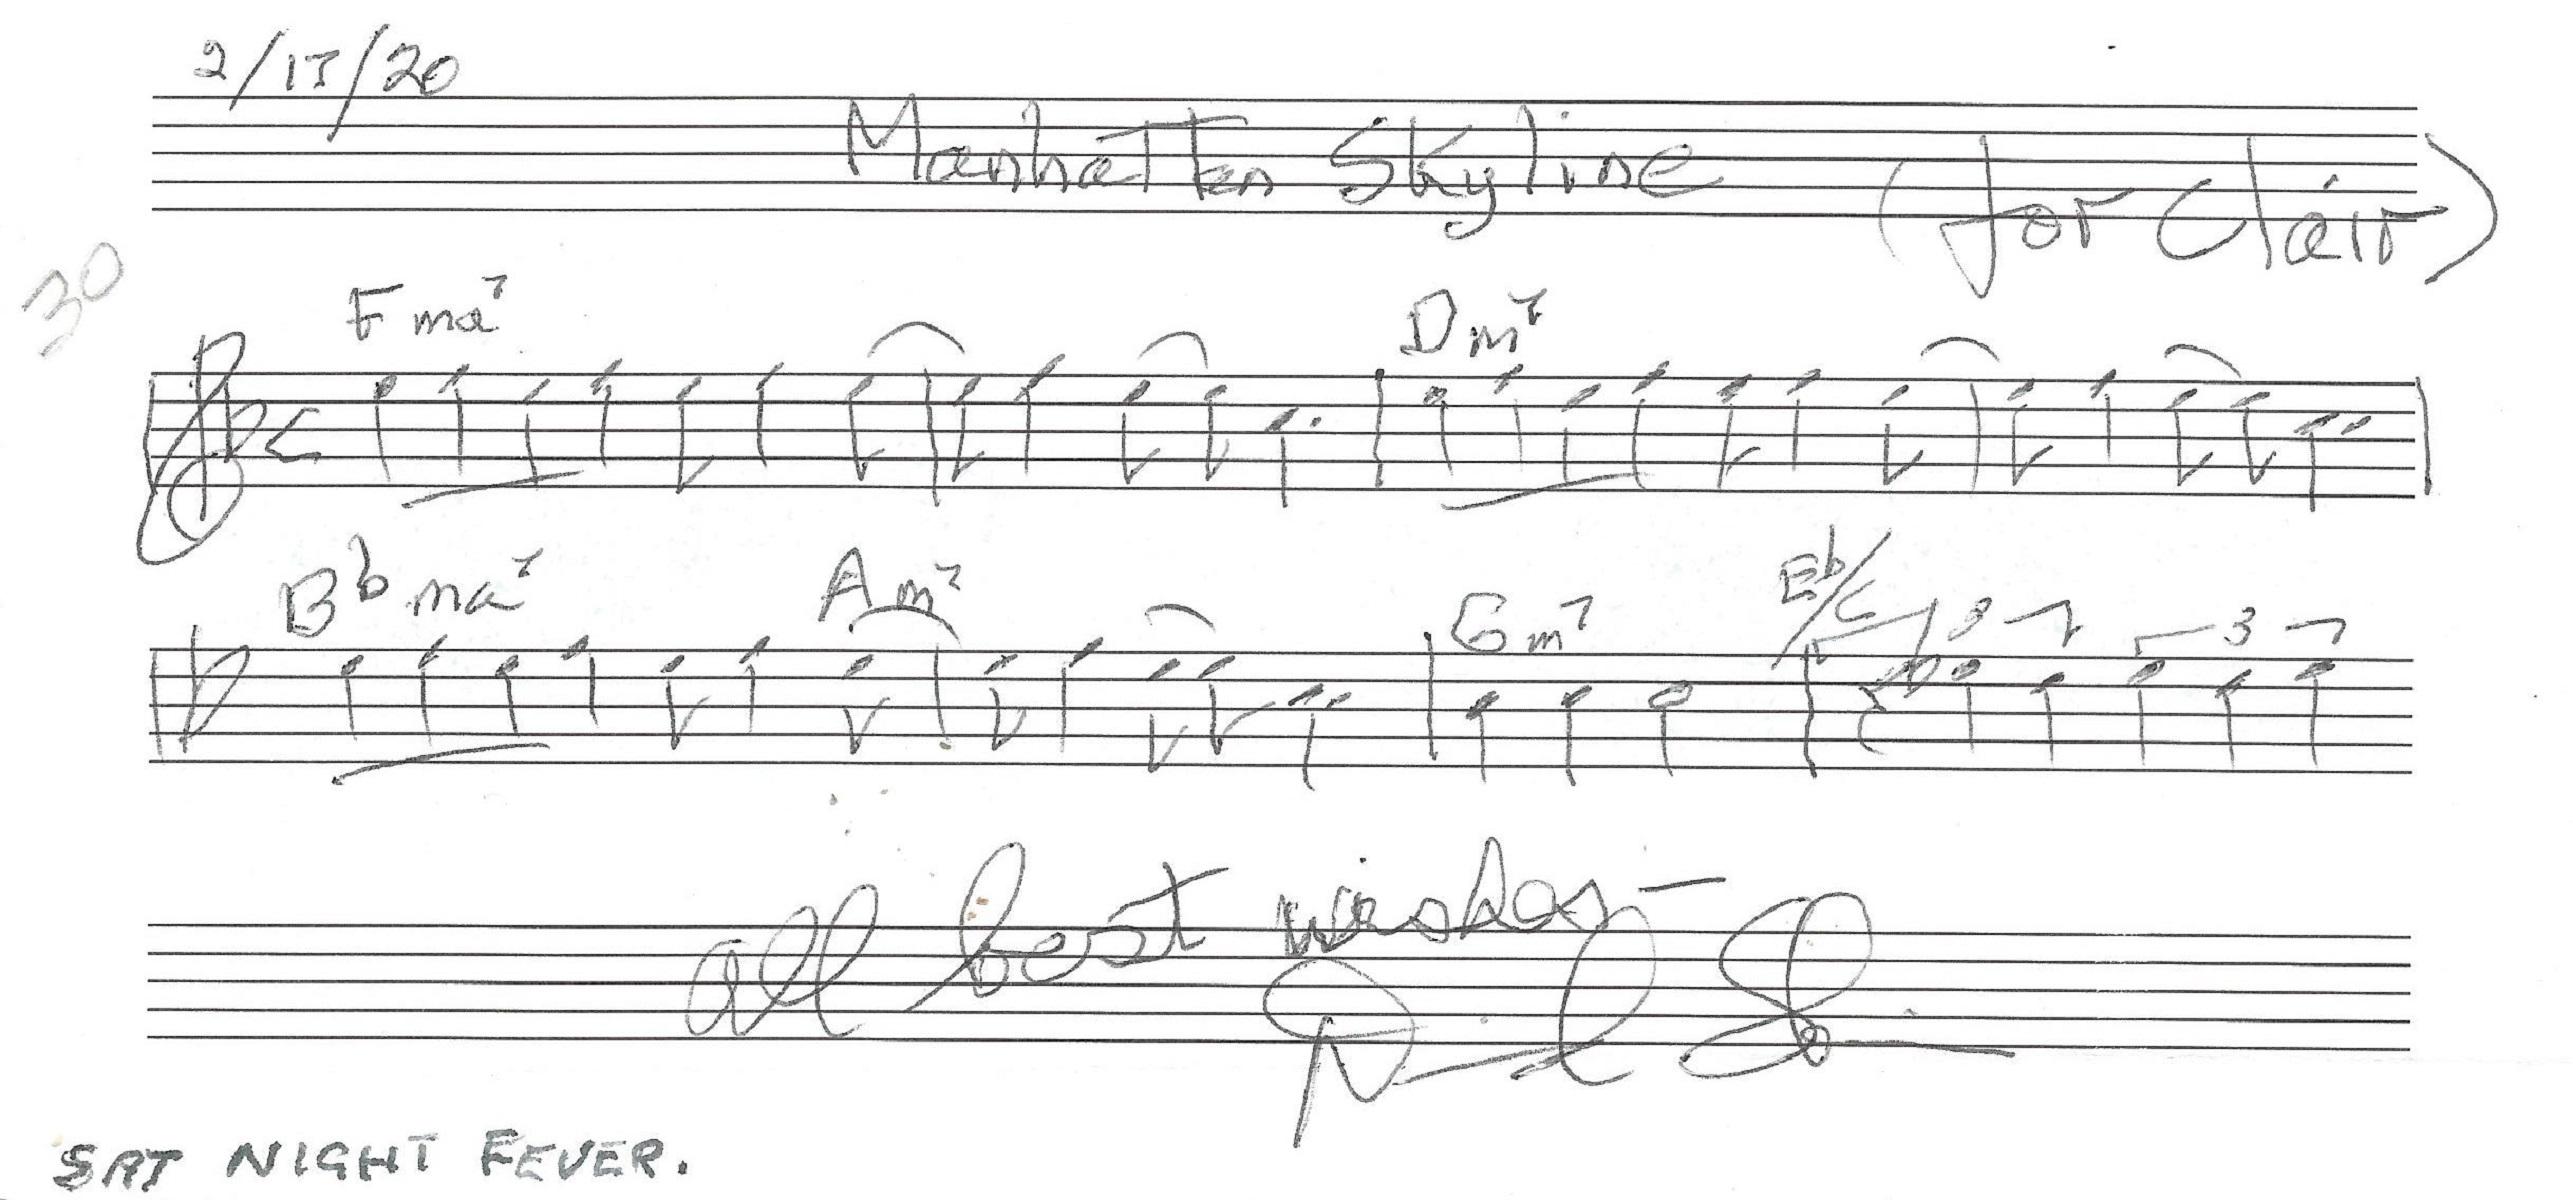 David Shire music score dedicated signature piece featuring Manhattan Skyline, from Saturday Night